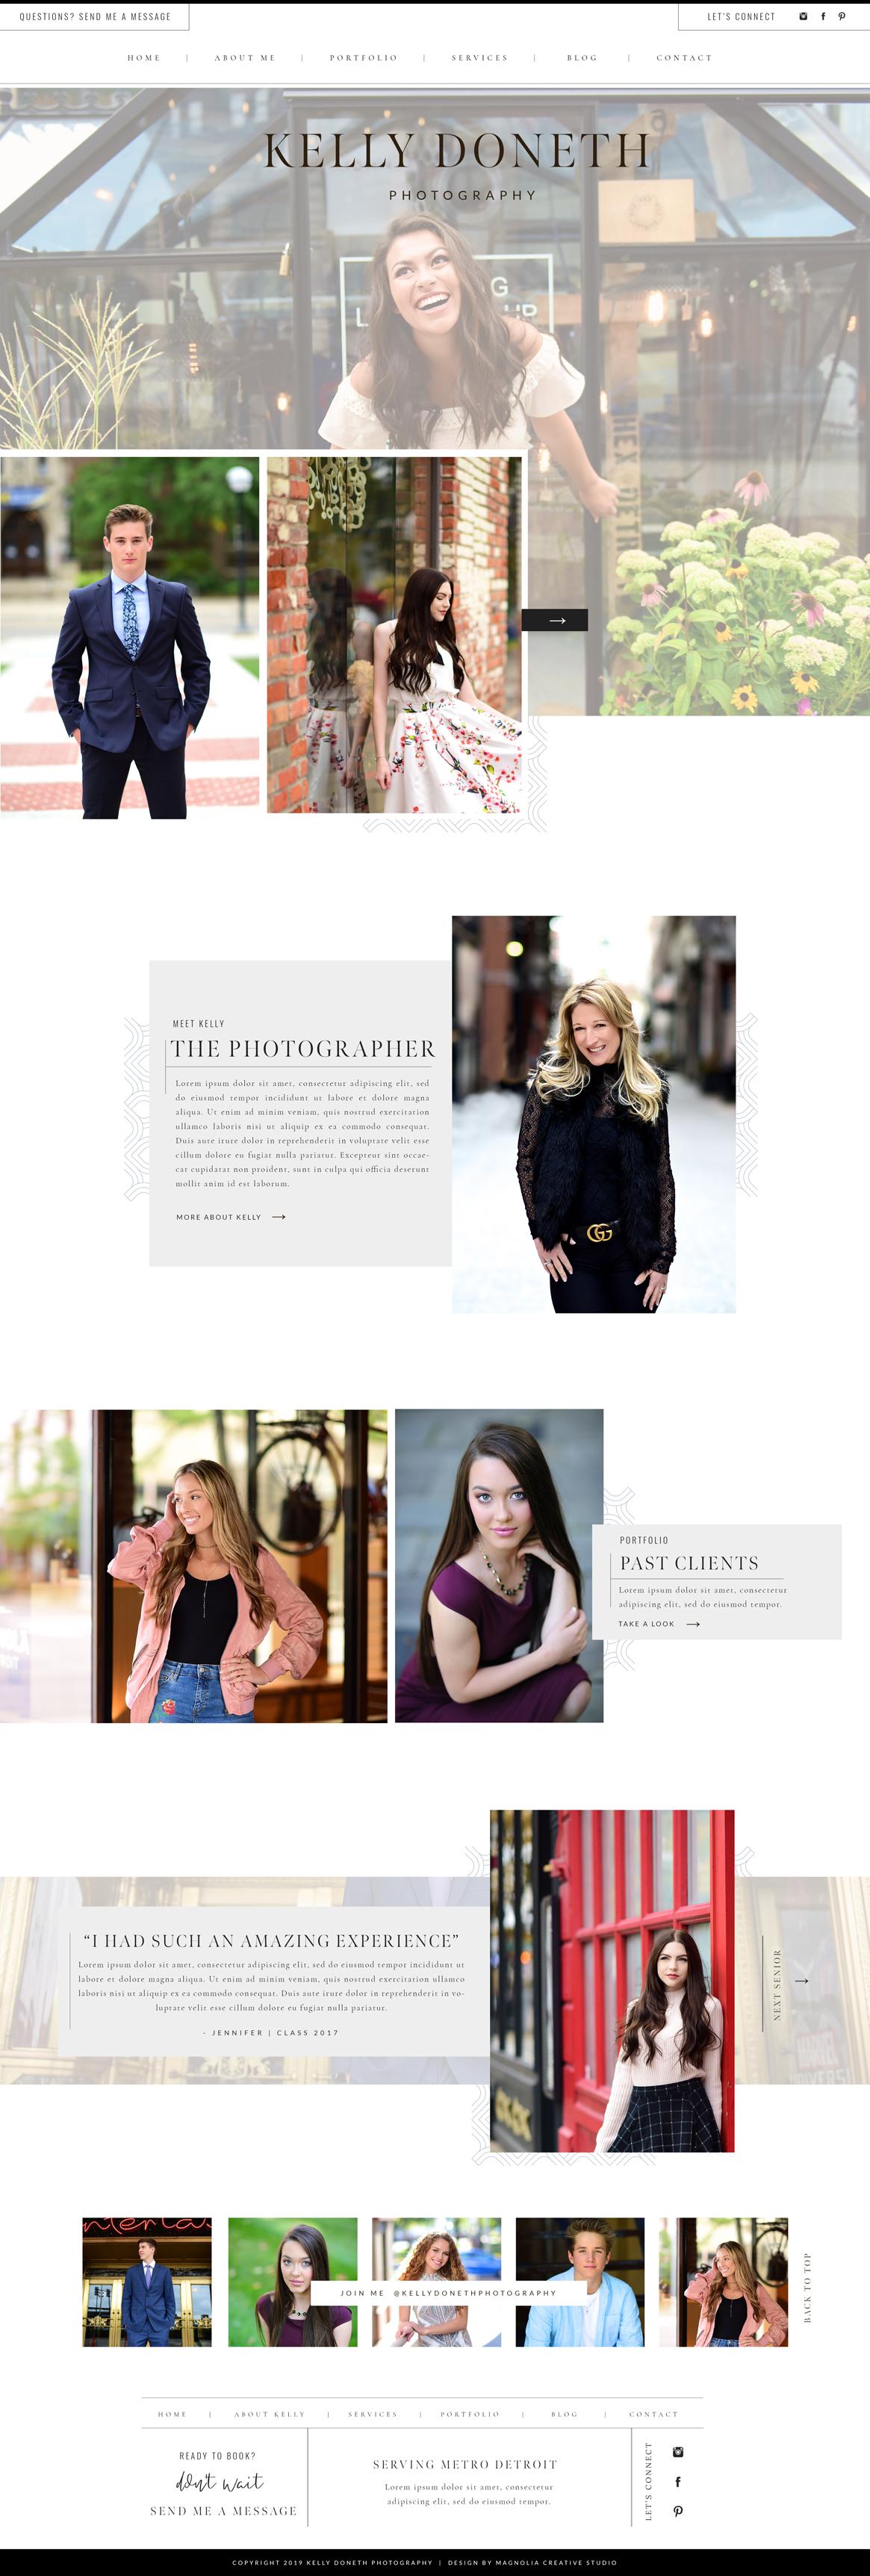 Kelly-Doneth-Photography-by-Magnolia-Creative-Studio-(2).jpg